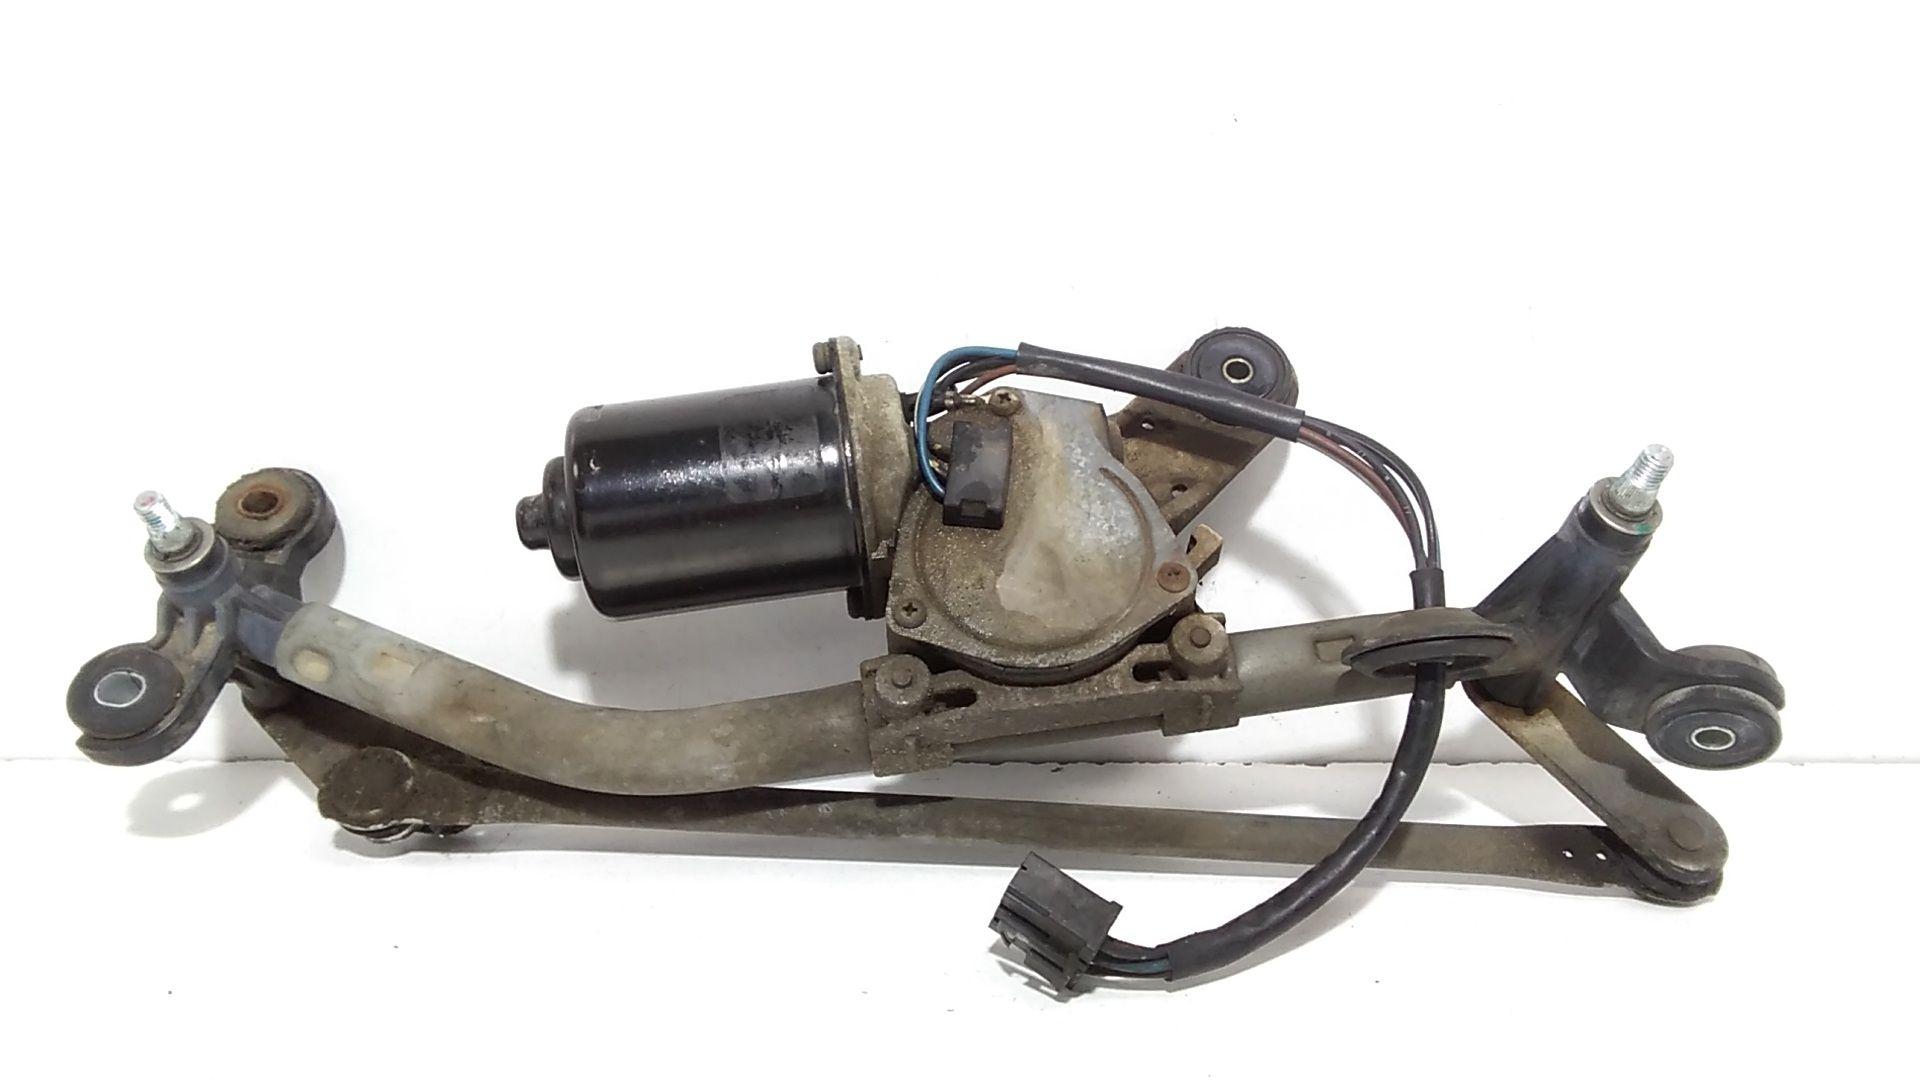 MOTORINO TERGI ANT COMPLETO DI TANDEM CHEVROLET Matiz 3° Serie 800 Benzina (2007) RICAMBI USATI